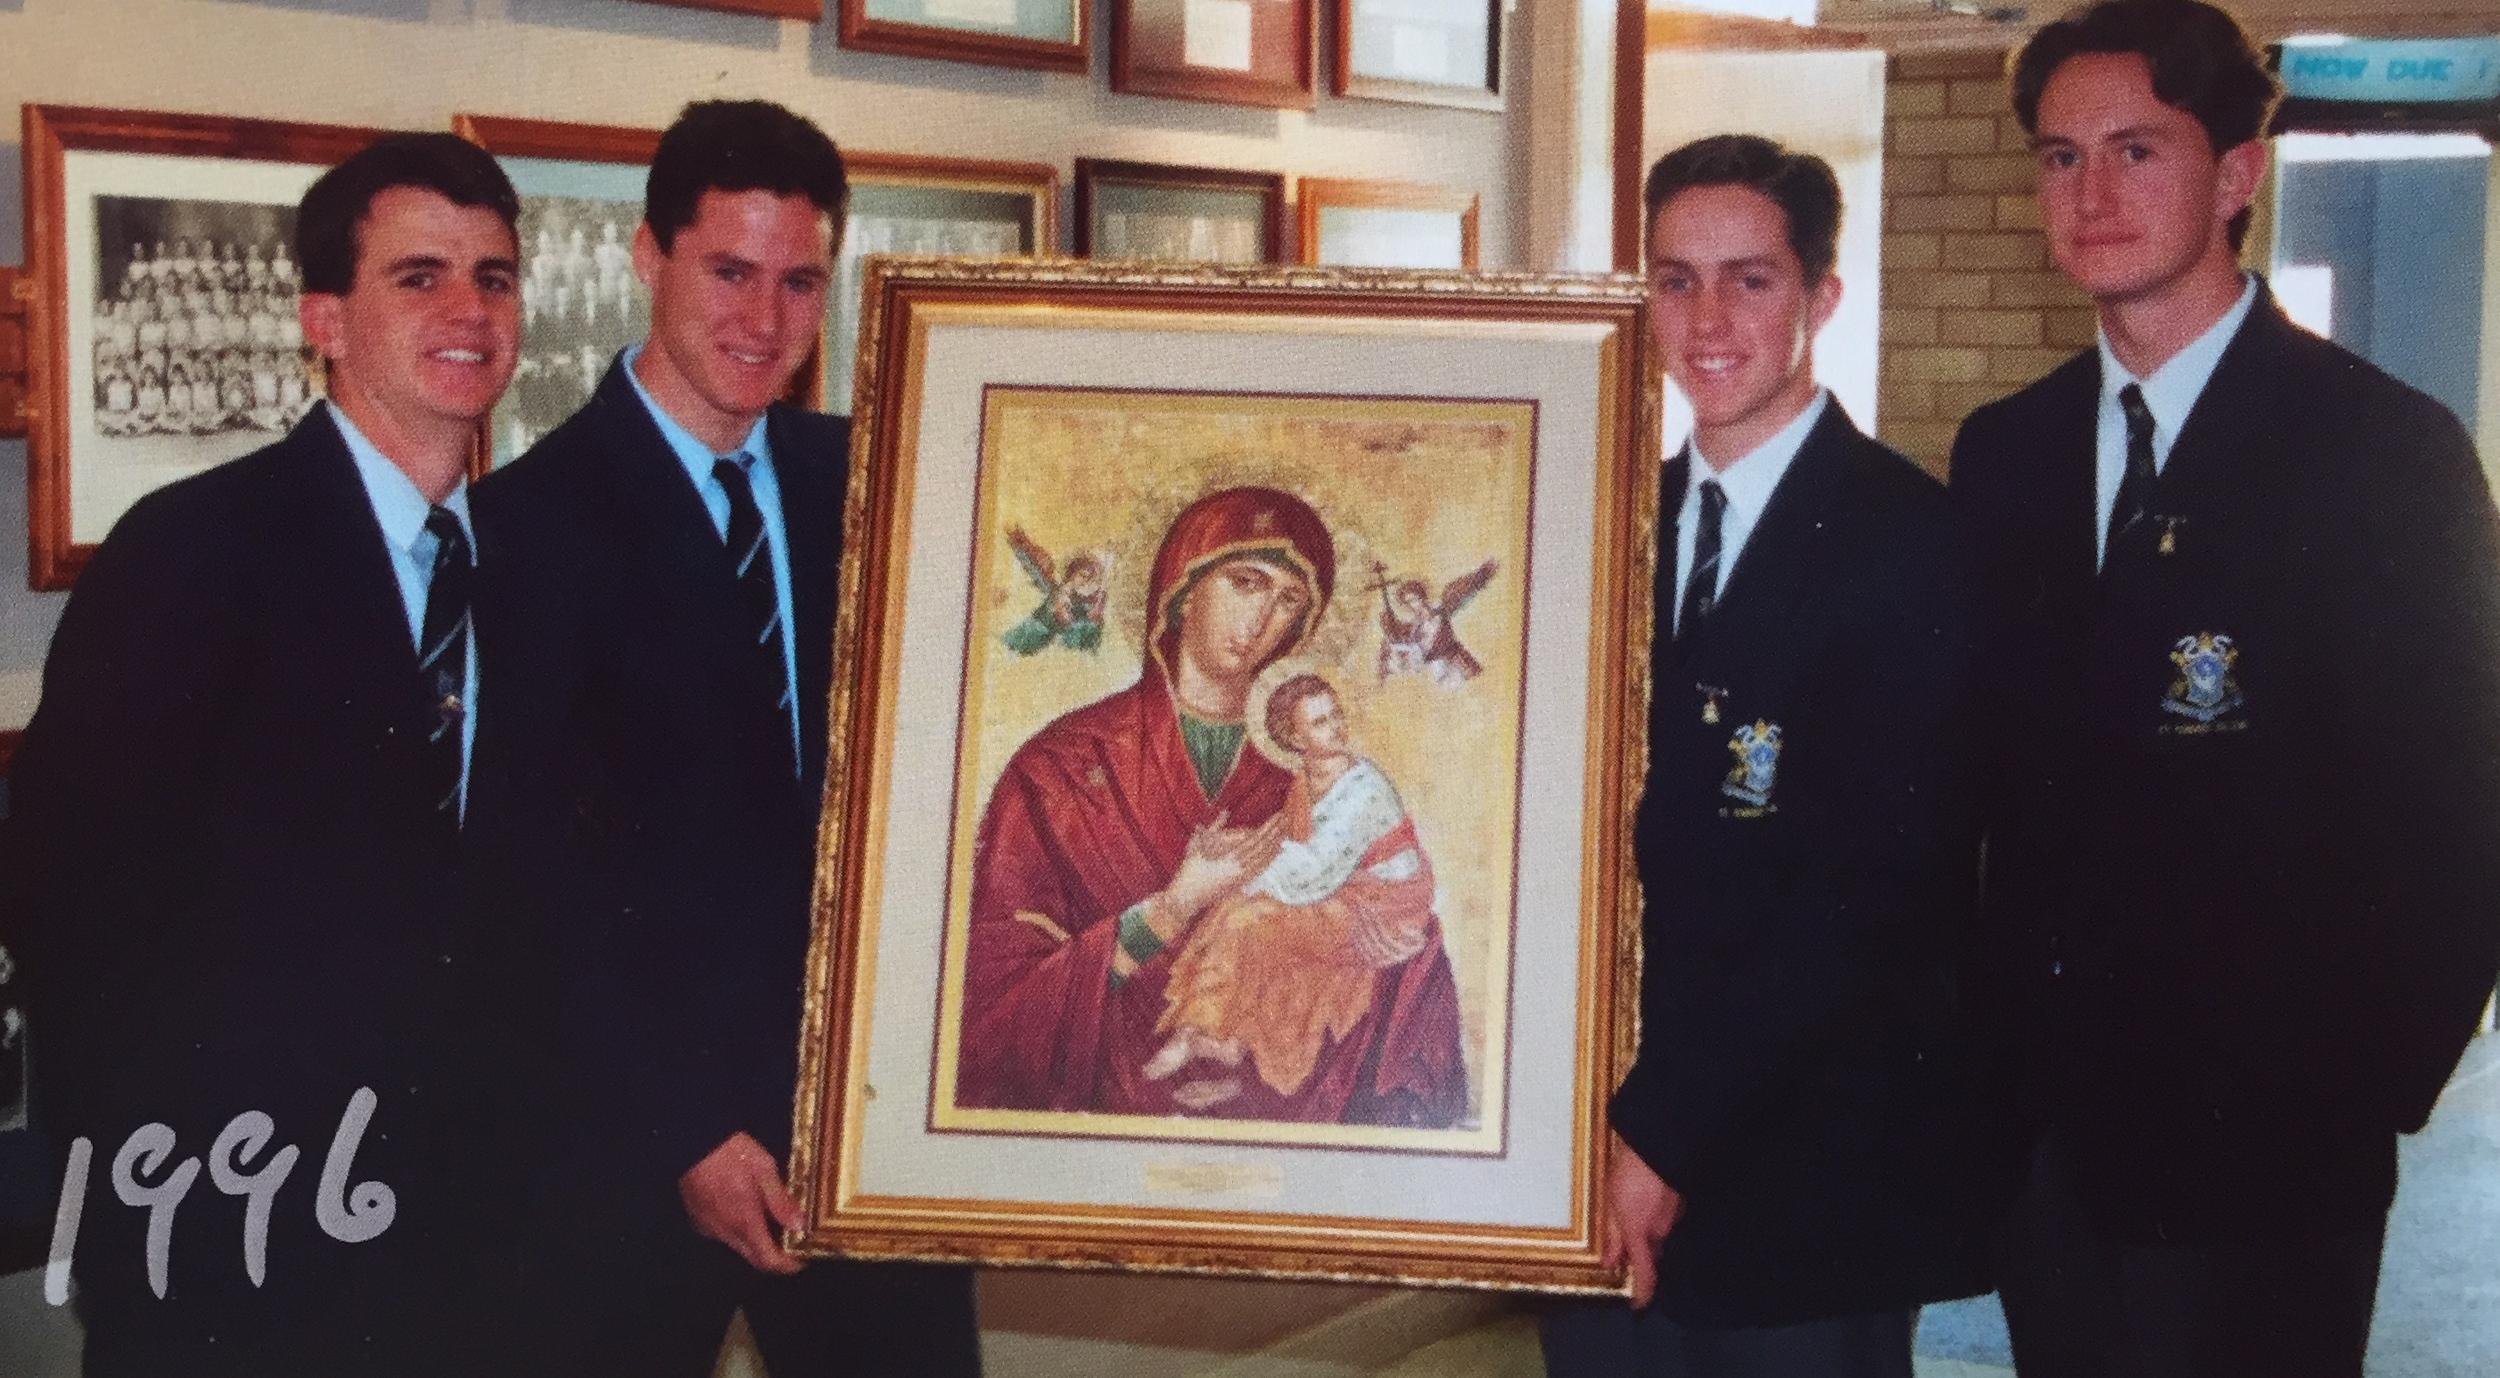 Marist College Canberra, 1996